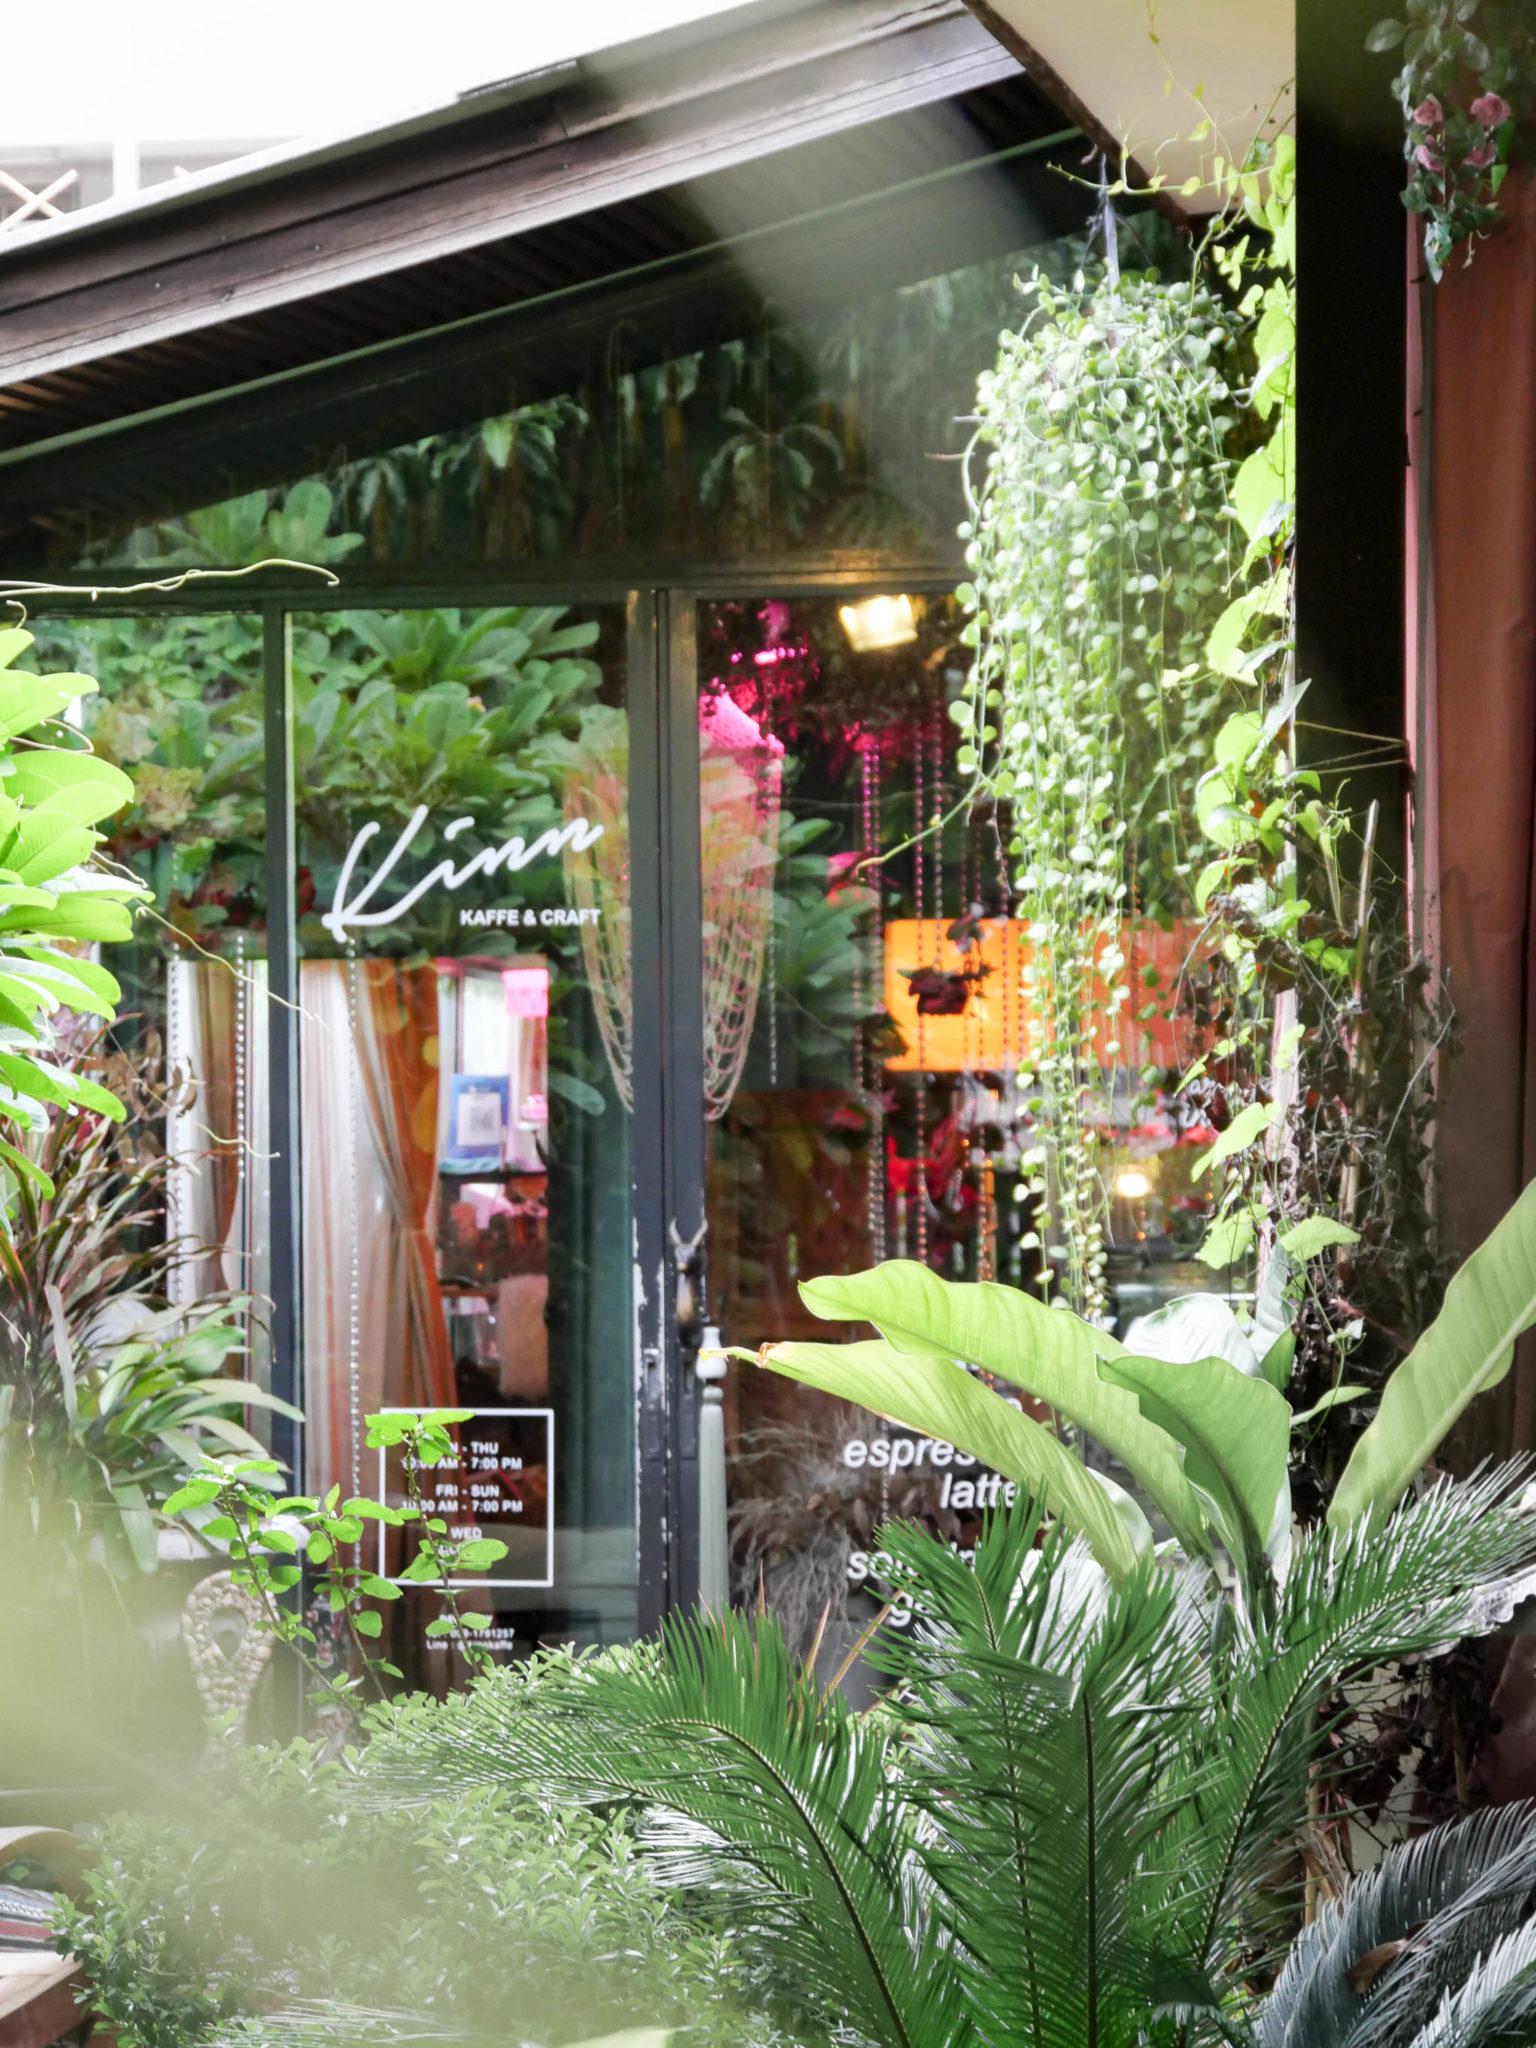 "7 Simply Creative Cafe & Bar ในย่านไลฟ์สไลต์สุดฮิป กับ 24 Hr. Co-Working Space กลาง New Interchange ""รัชดา - ลาดพร้าว"" 36 - cafe"